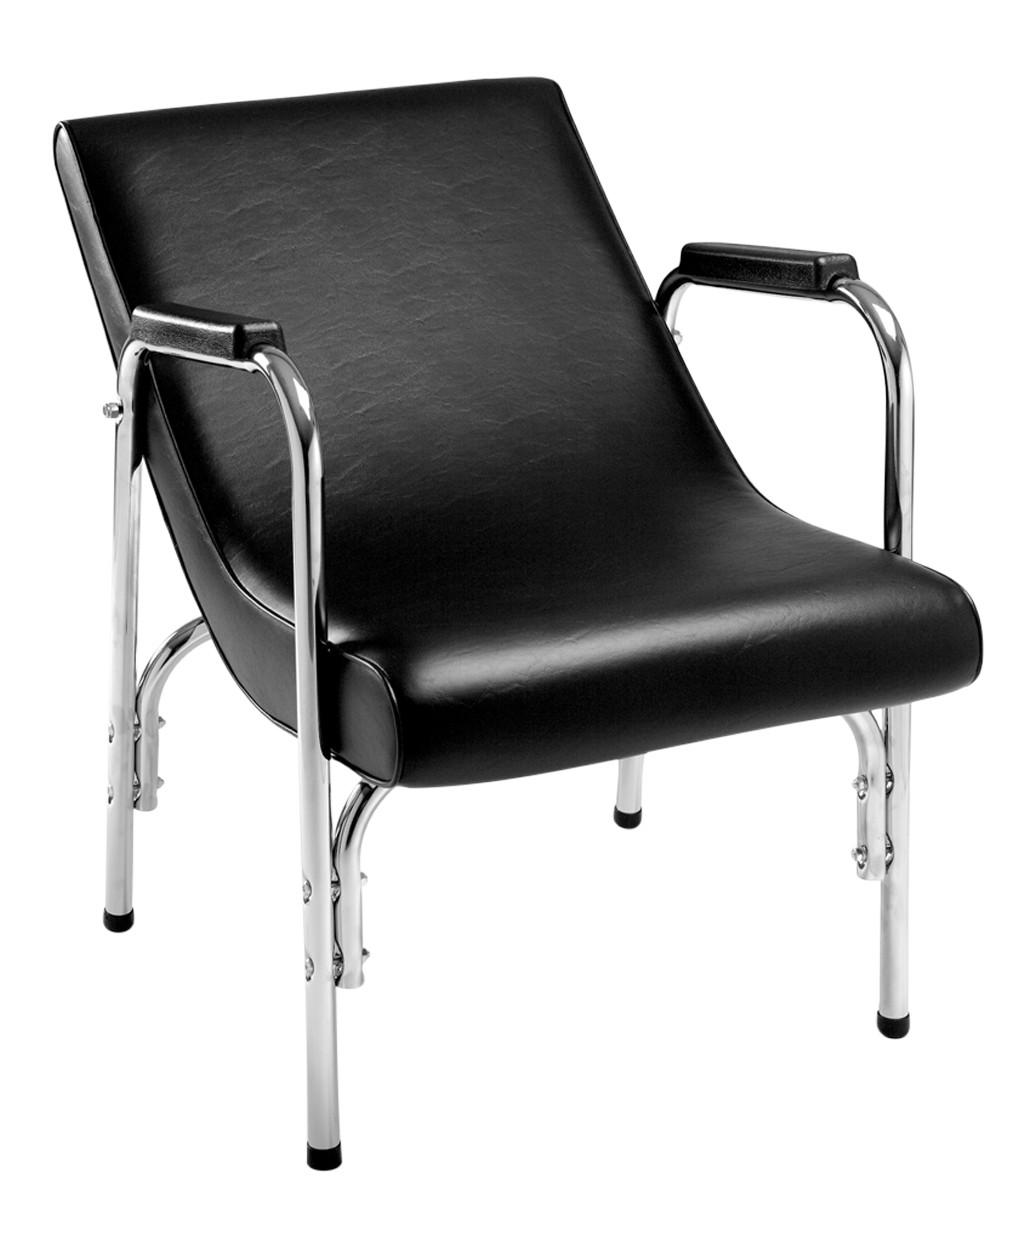 Pibbs 200 Lounge Shampoo Chair